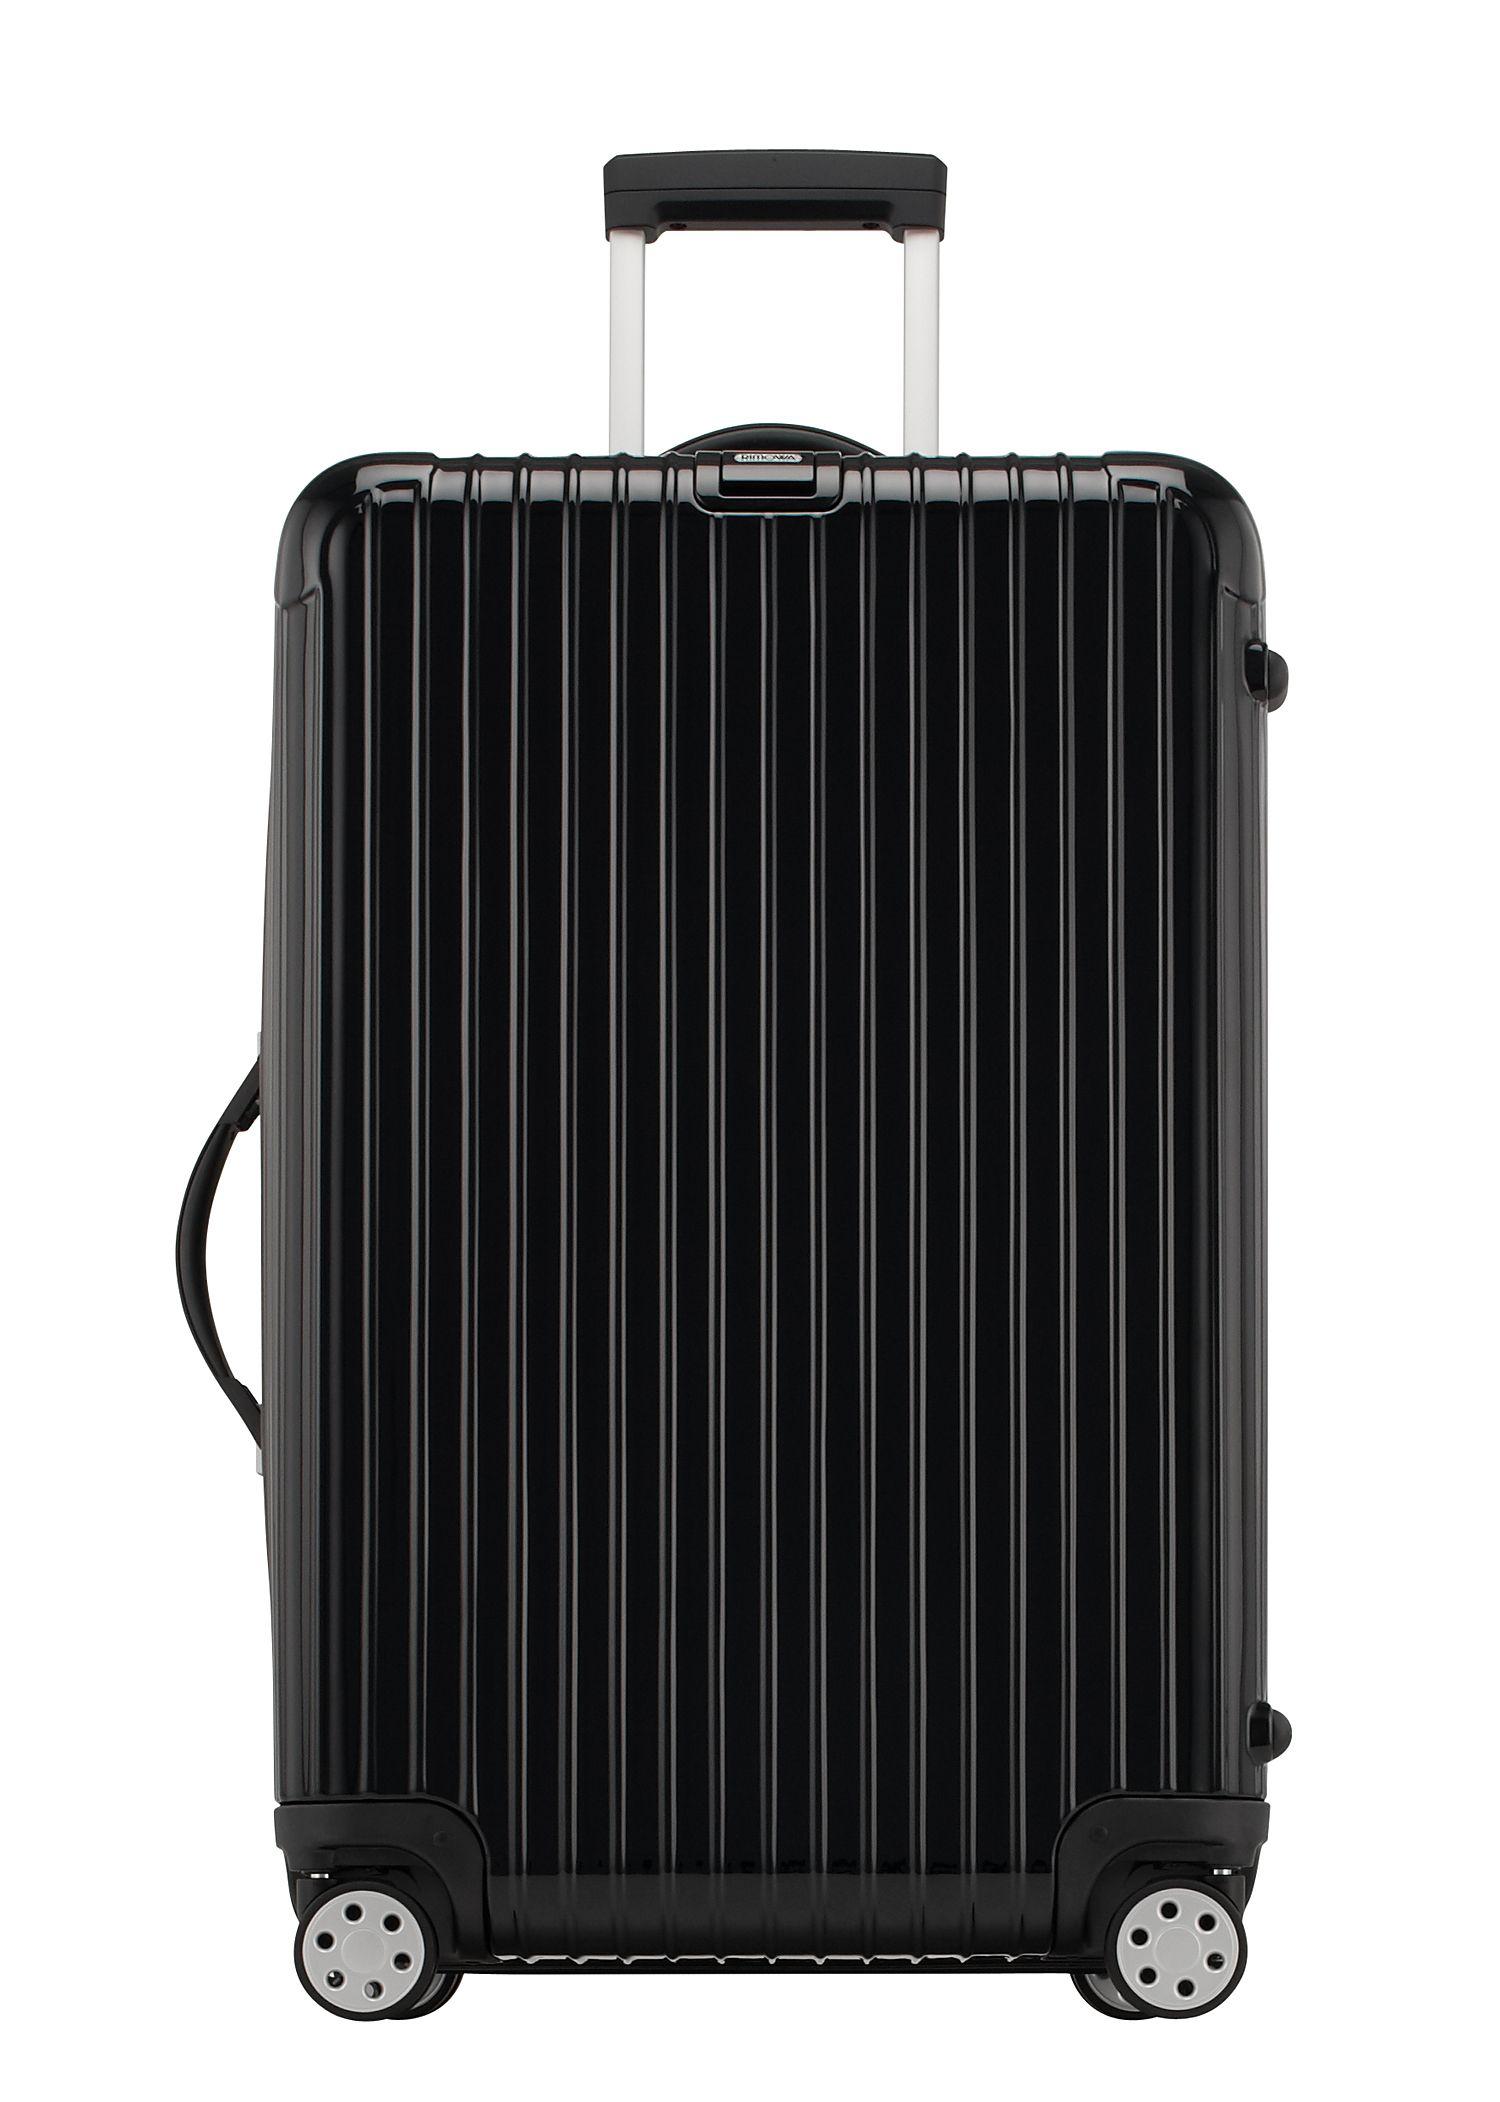 rimowa salsa deluxe multiwheel trolley 70 schwarz kofferexpress 24. Black Bedroom Furniture Sets. Home Design Ideas